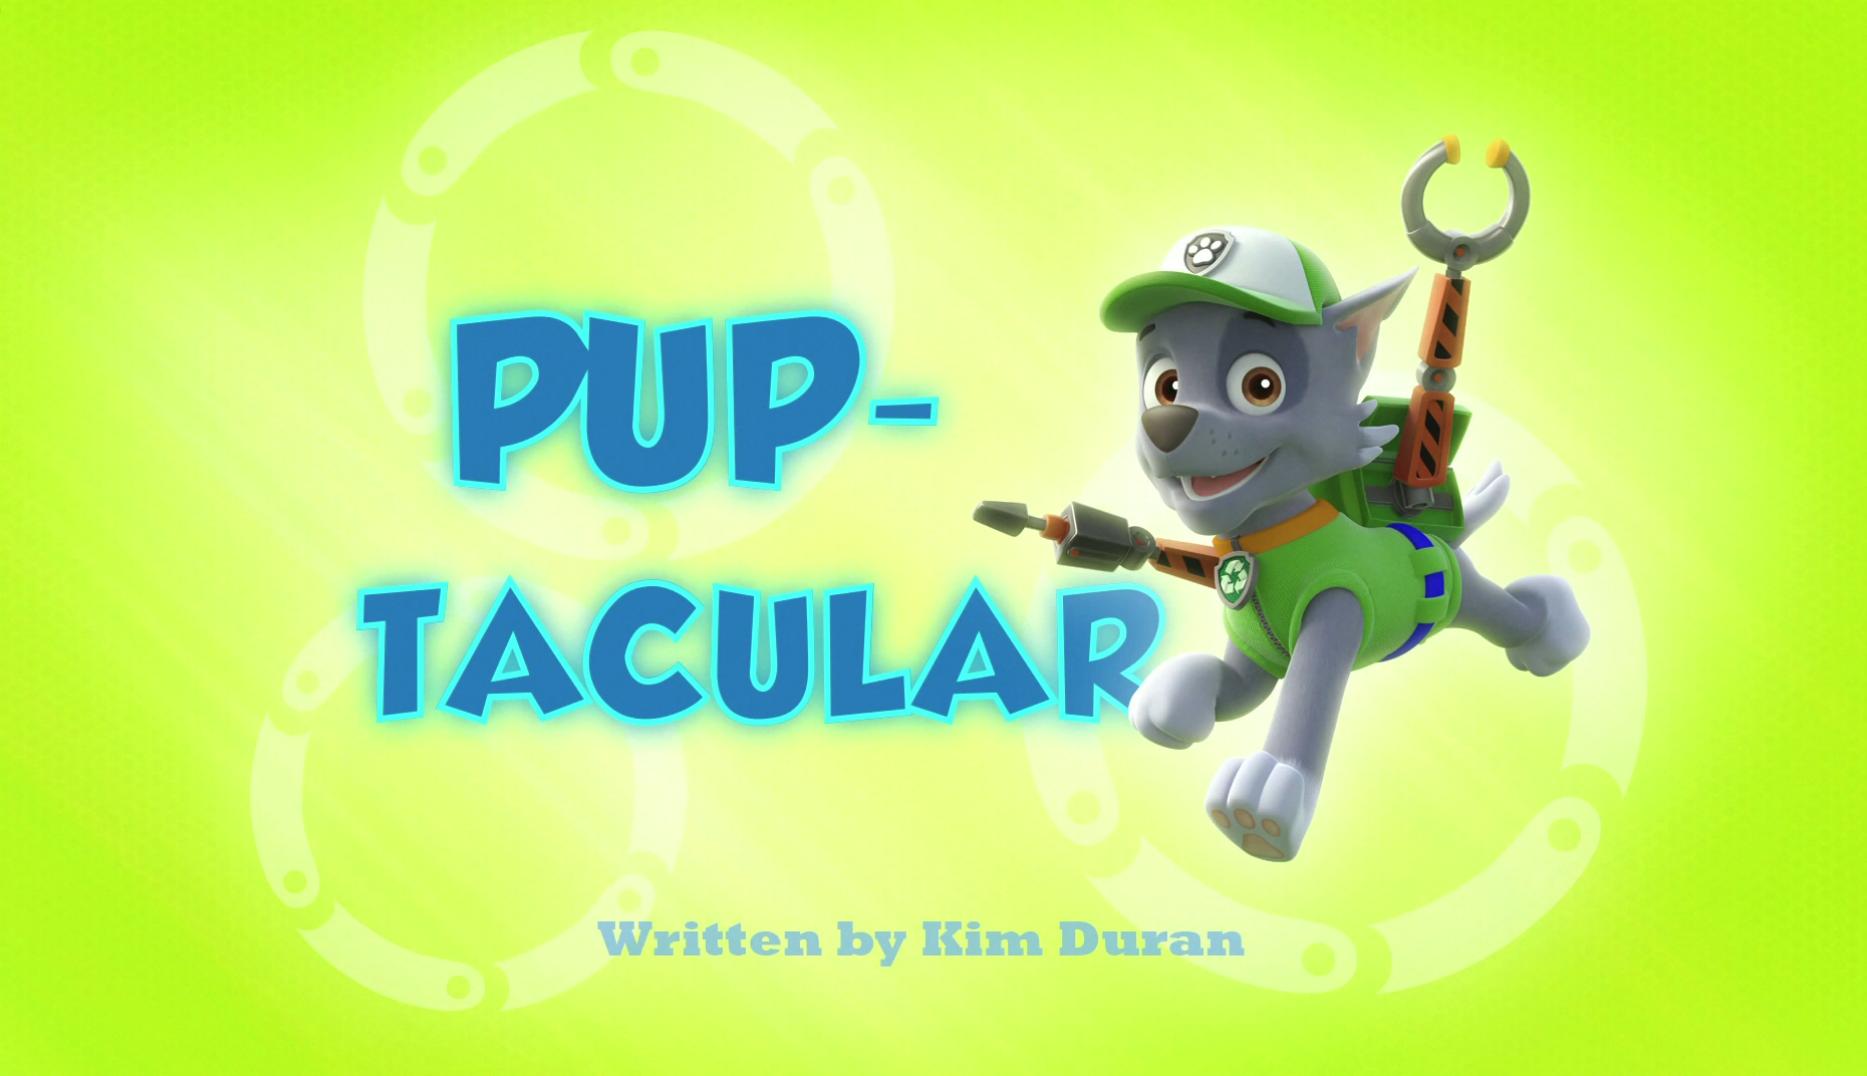 Pup Tacular Paw Patrol Wiki